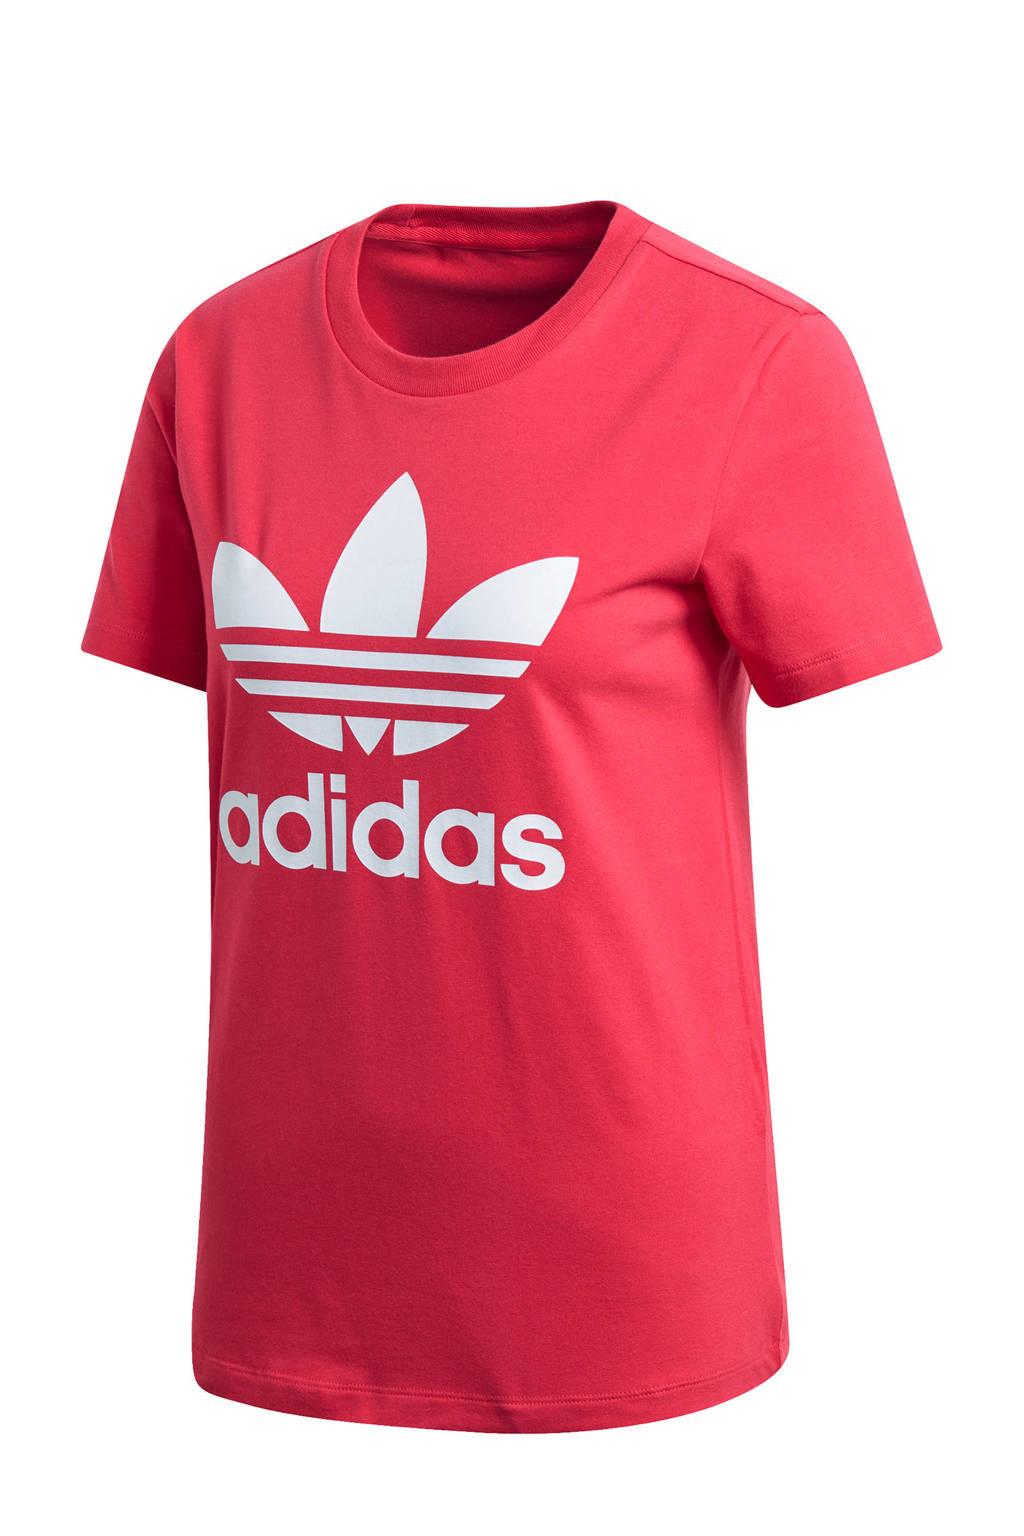 adidas Originals Adicolor T-shirt rood, Rood